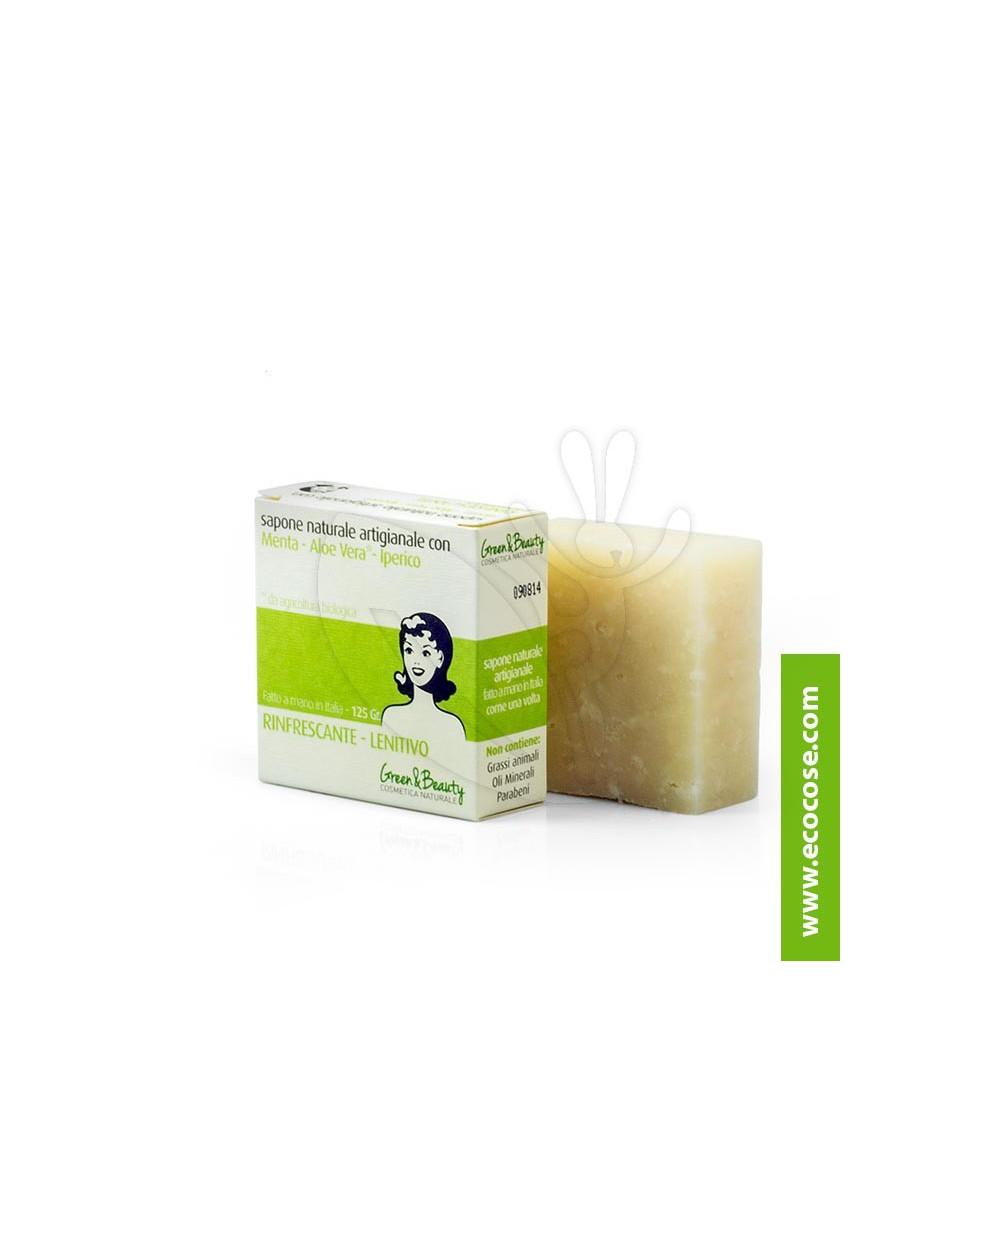 Green&Beauty - Sapone naturale artigianale Menta Aloe Iperico - Rinfrescante Lenitivo